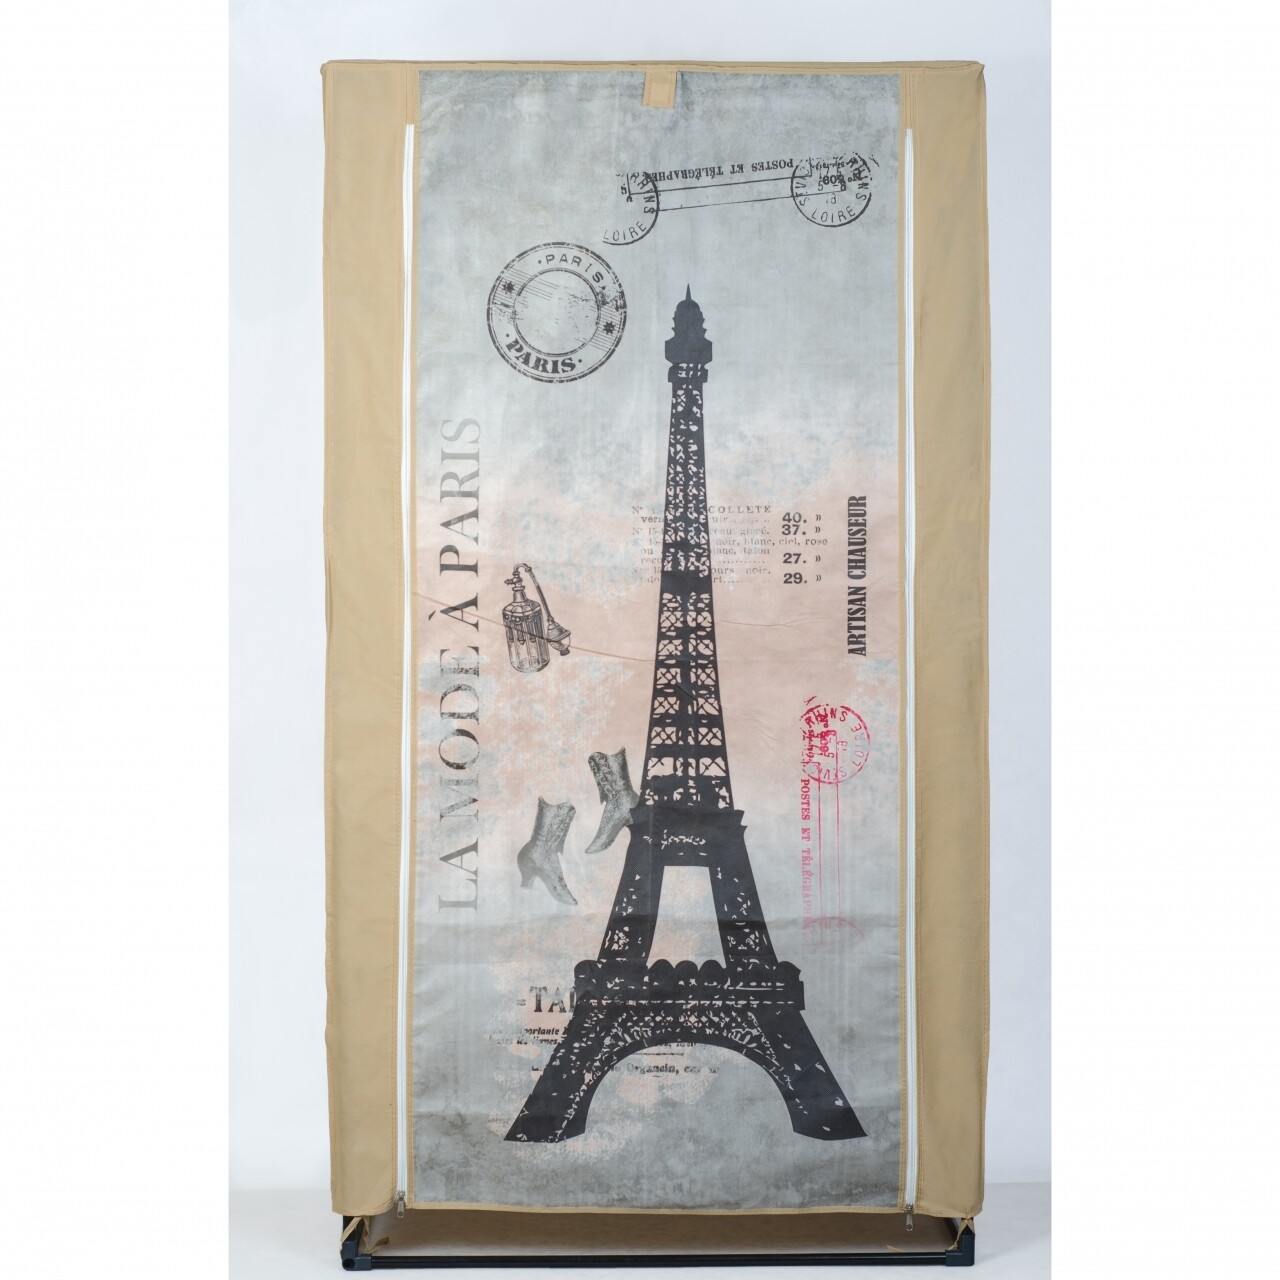 Dulap pentru haine Paris, Jocca, 156 x 46 x 87 cm, polipropilena, bej